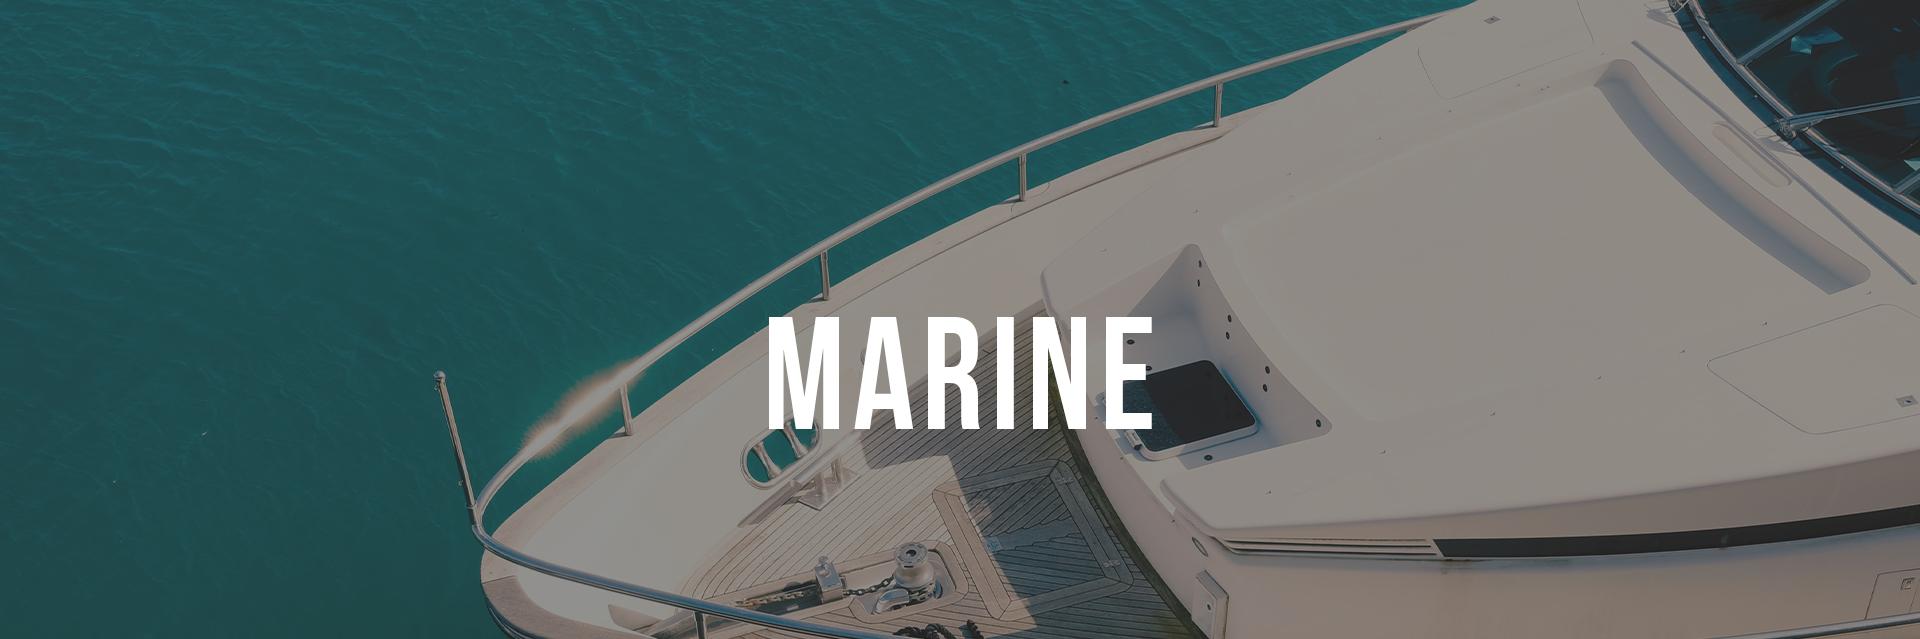 Marine Header